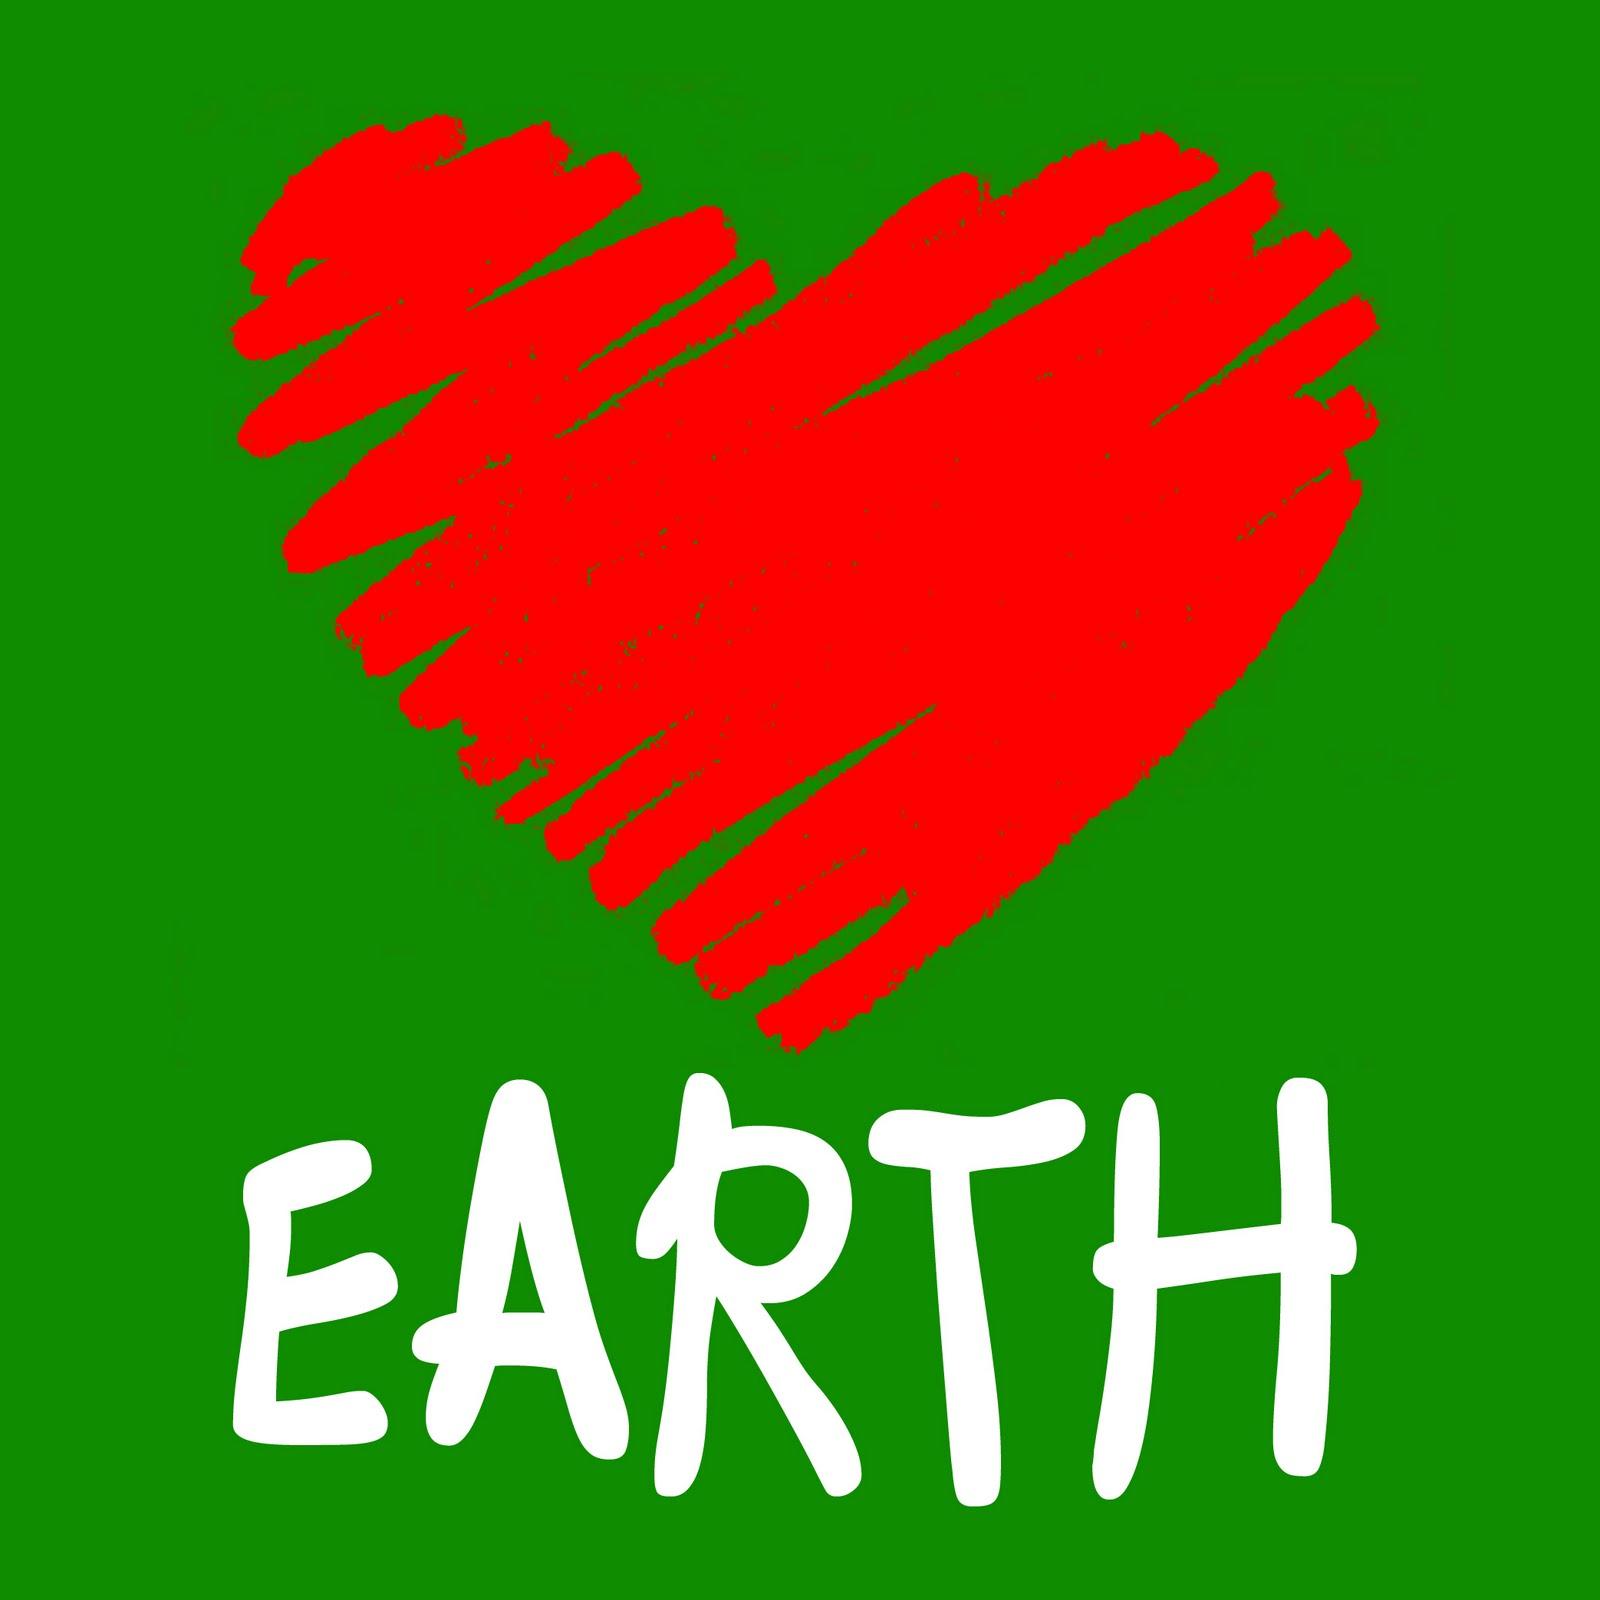 love планета знакомства новость